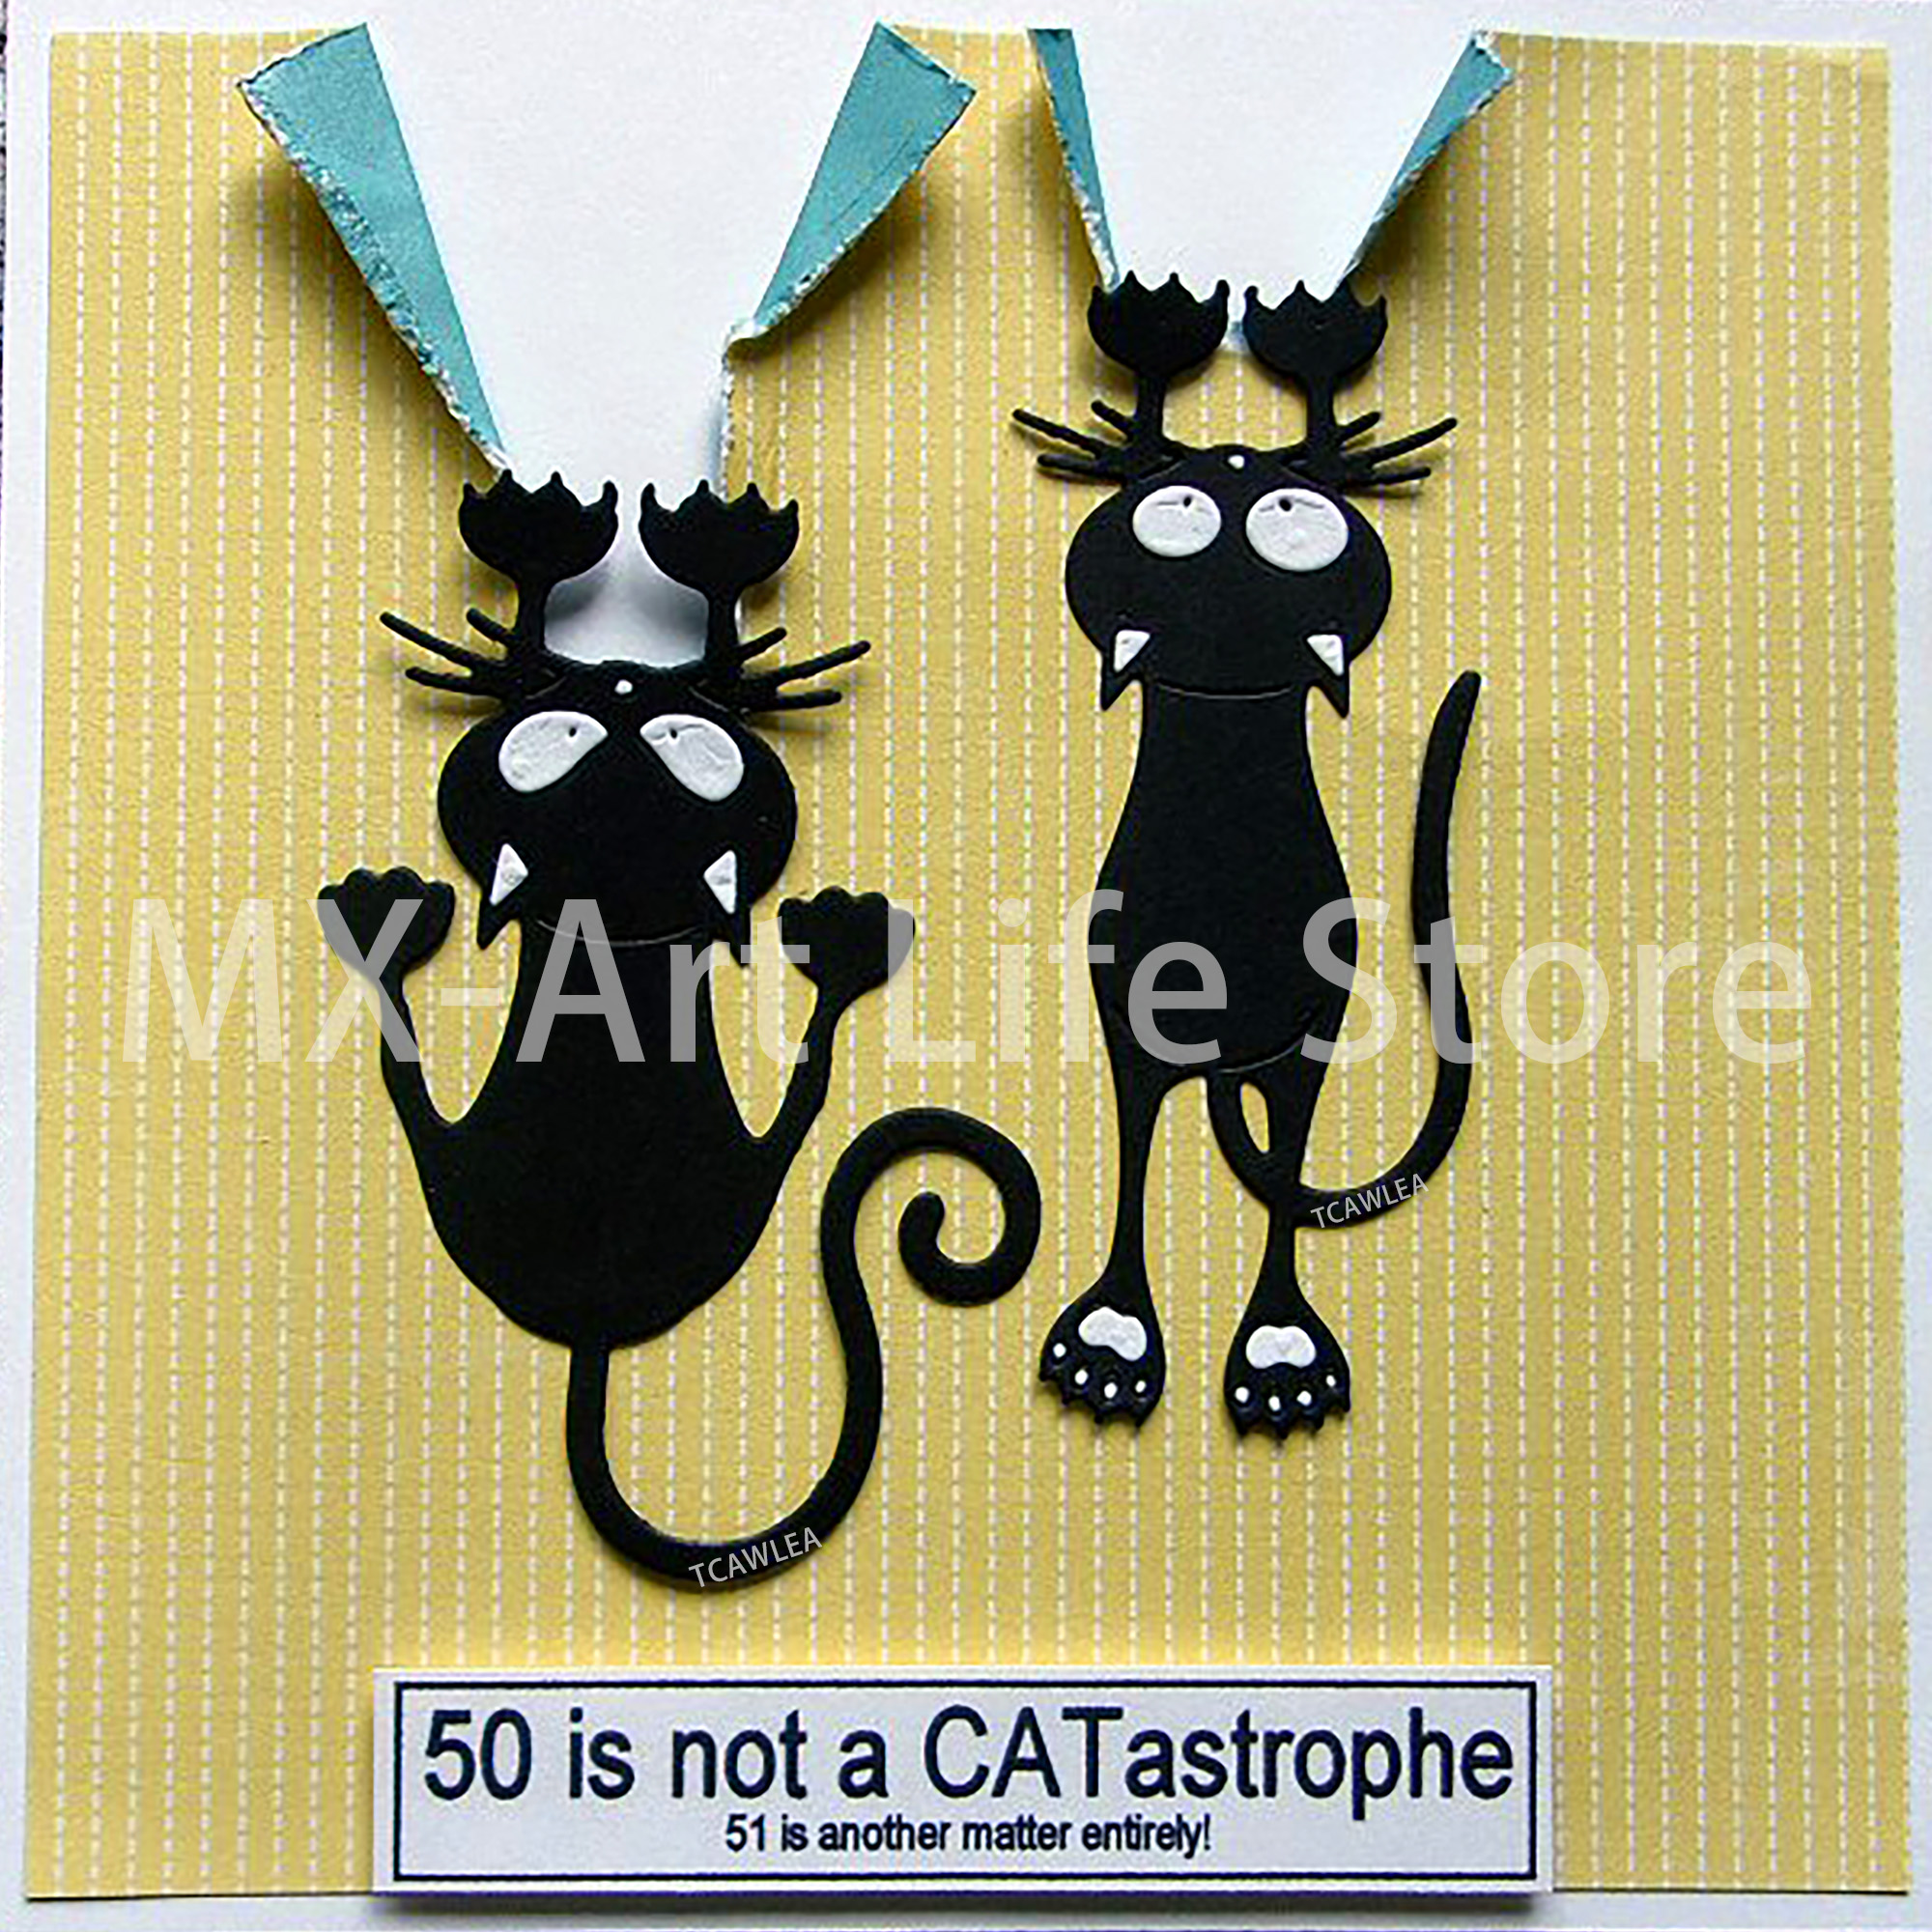 Lovely Black Pet Cat Metal Cutting Dies Cute Animal Stencil For DIY Scrapbooking Card Decorative Embossing